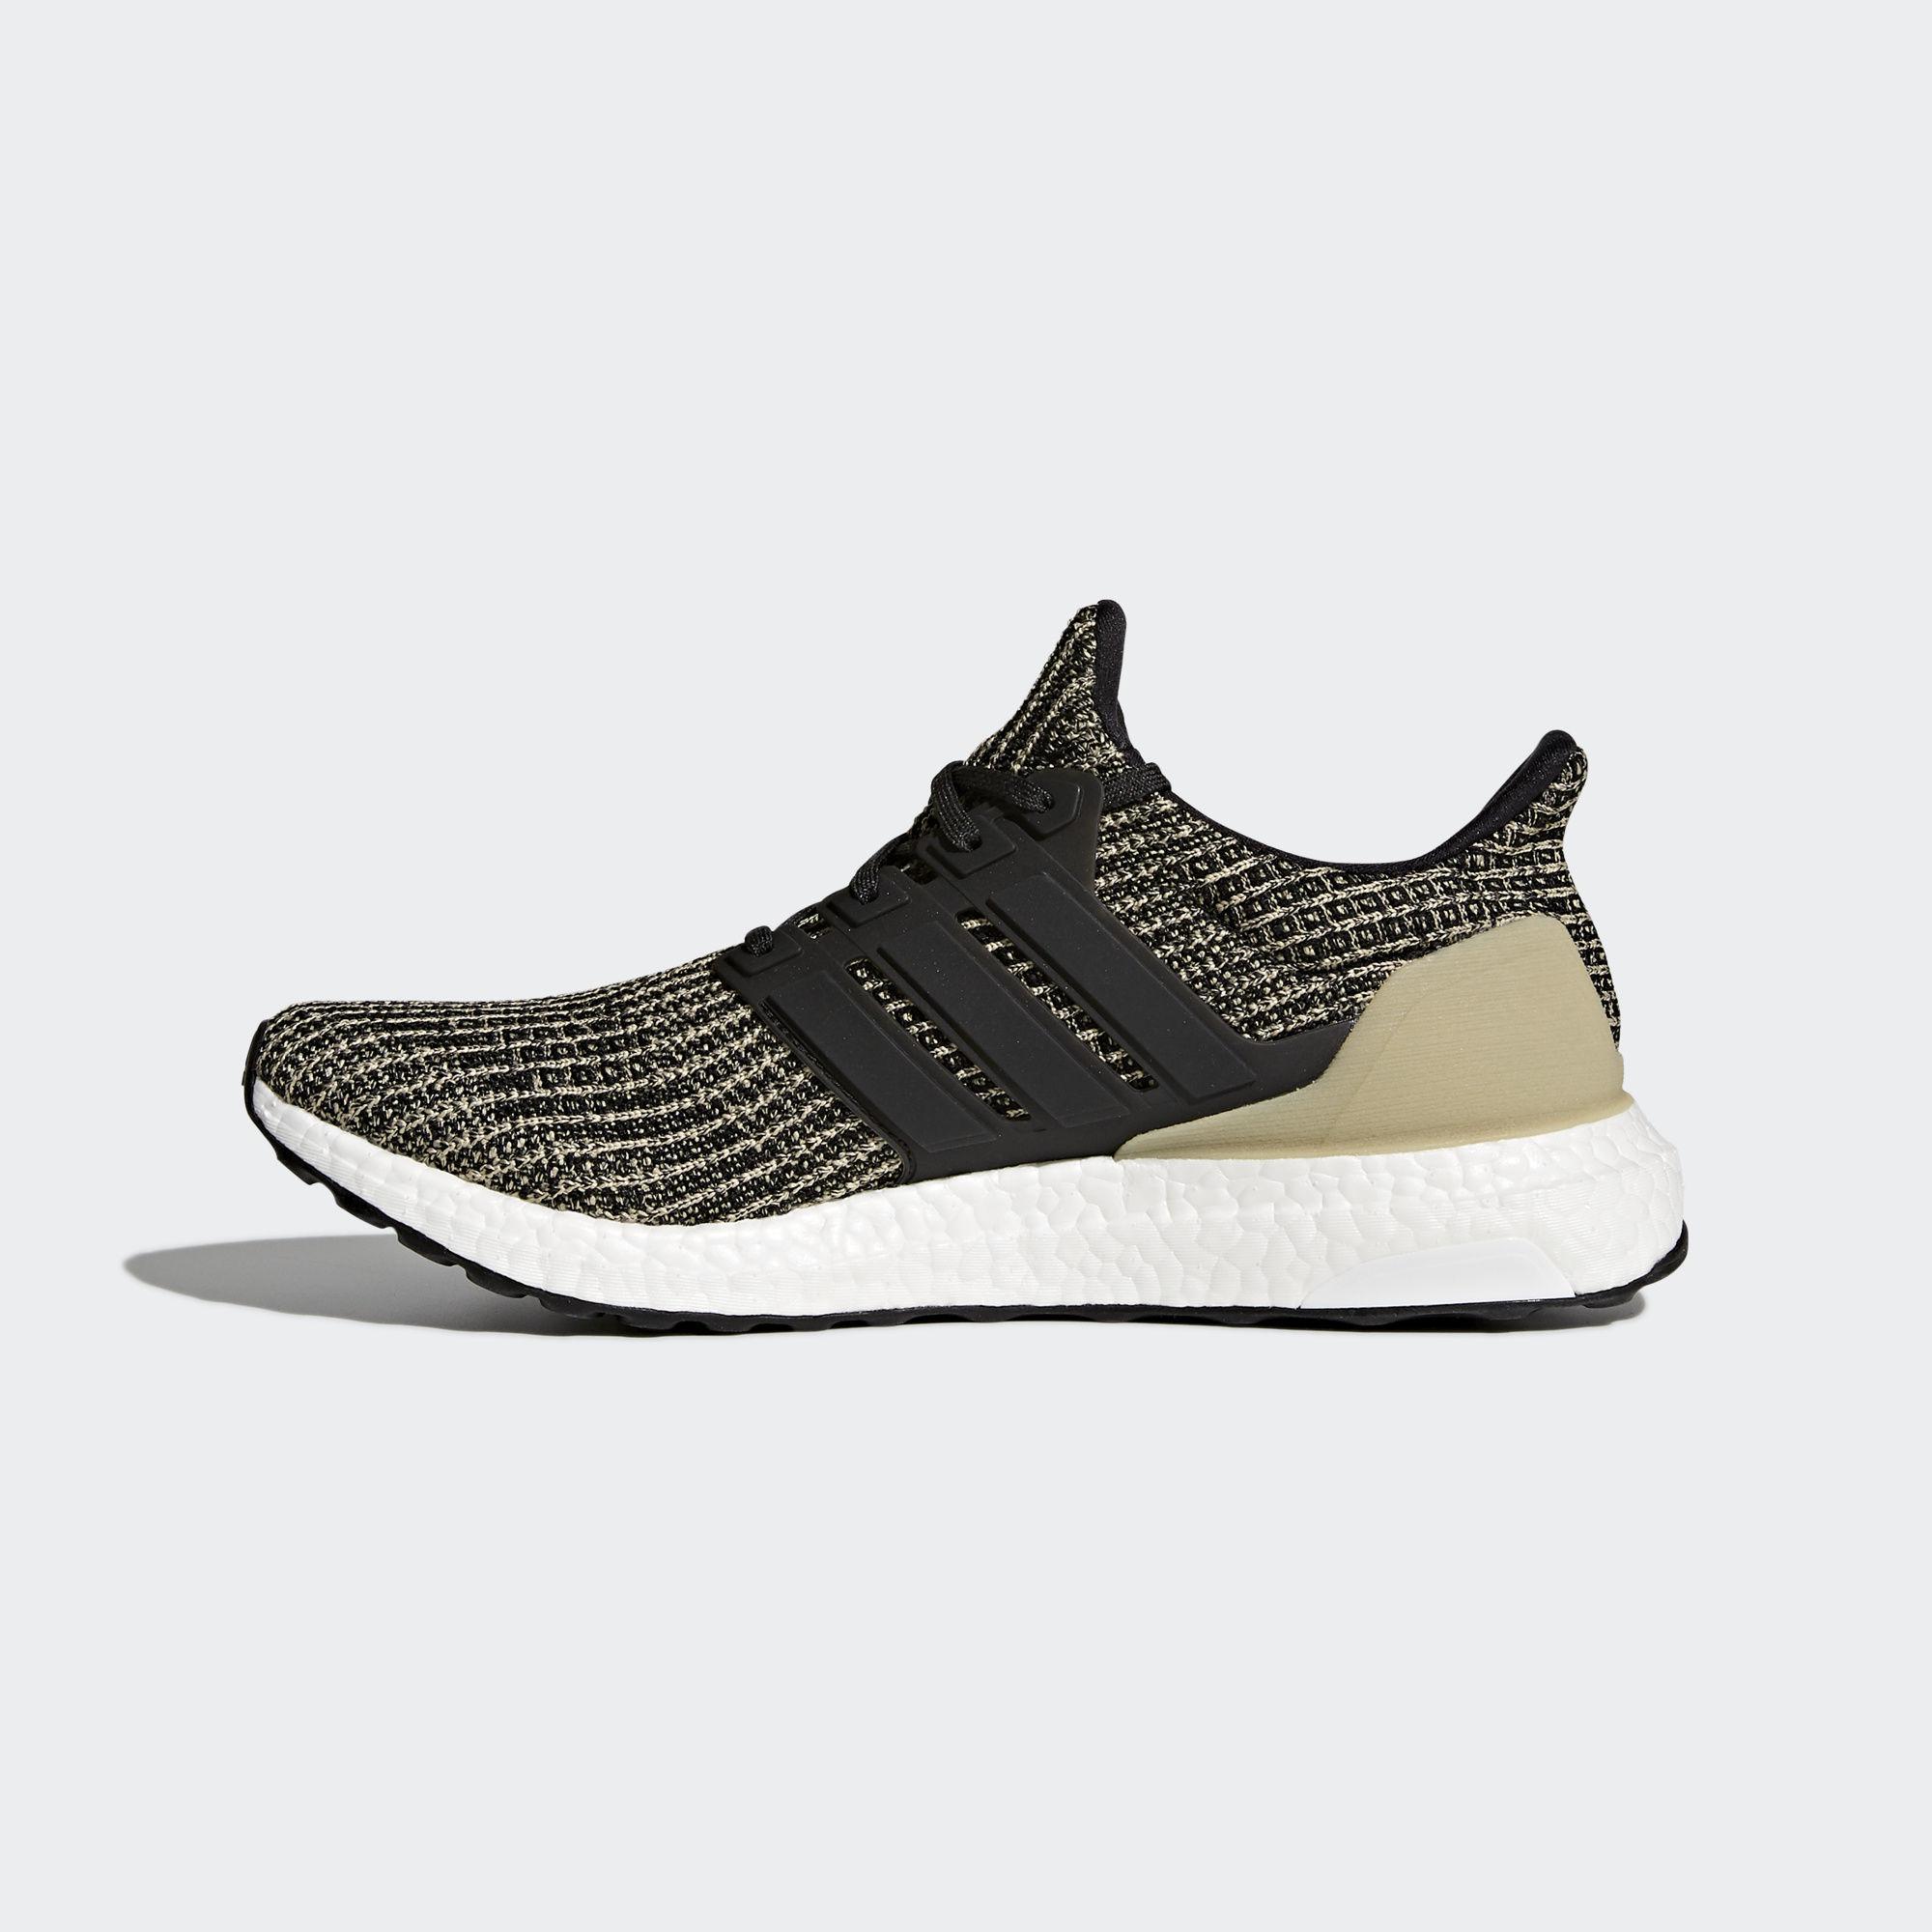 eb562b70242709 Adidas Mens Ultra Boost Running Shoes - Dark Mocha - Tennisnuts.com